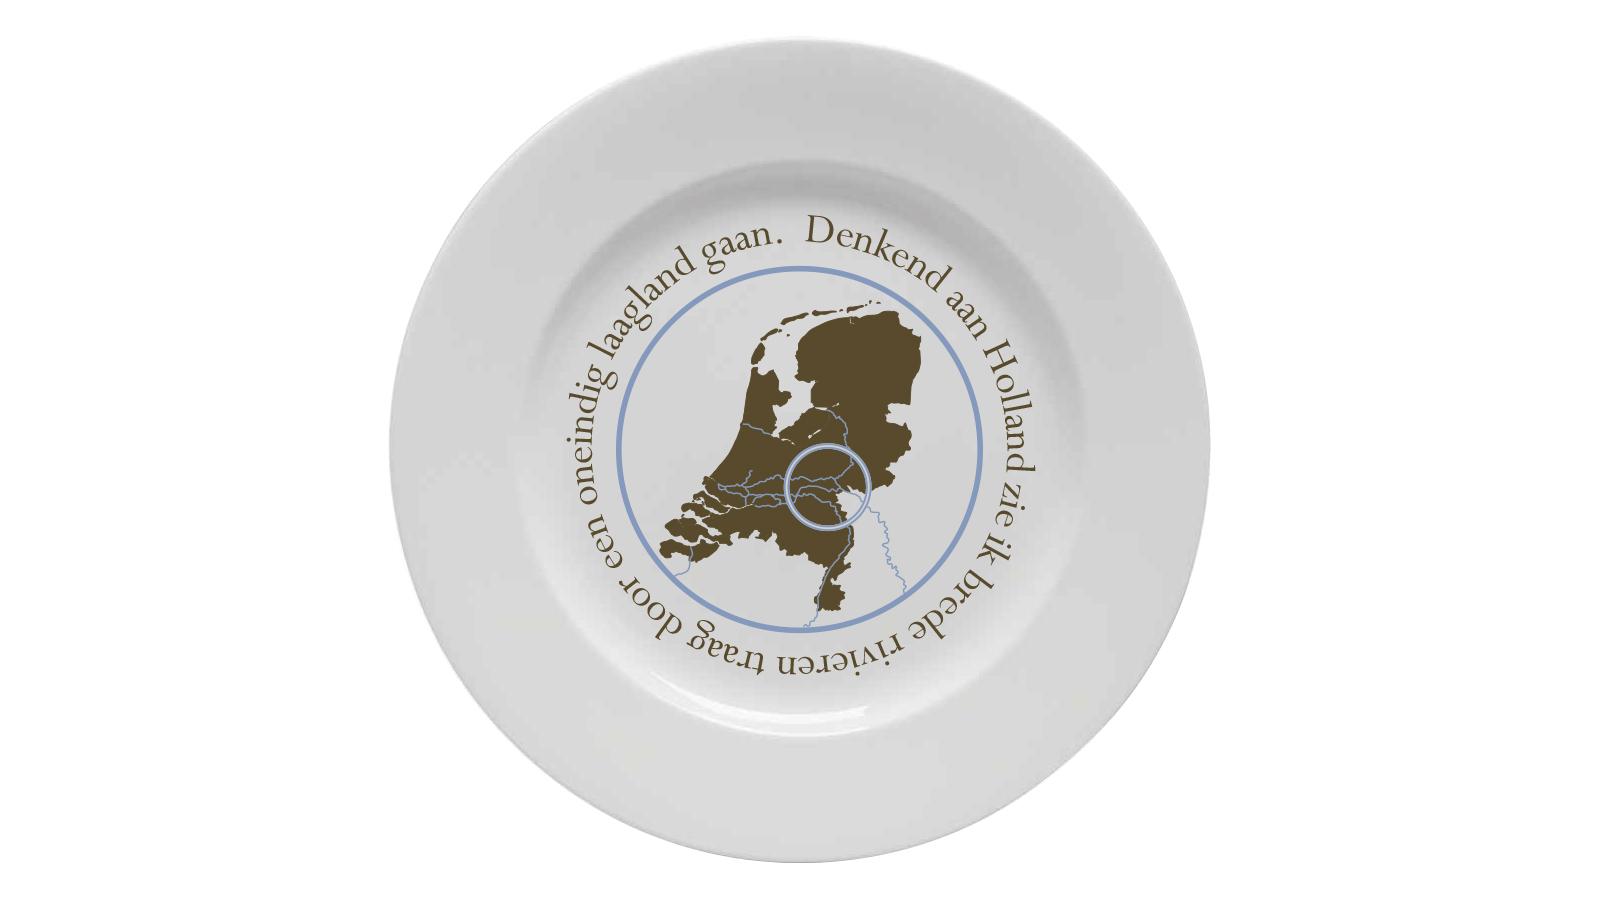 LandRaad Ontbijtbord 1